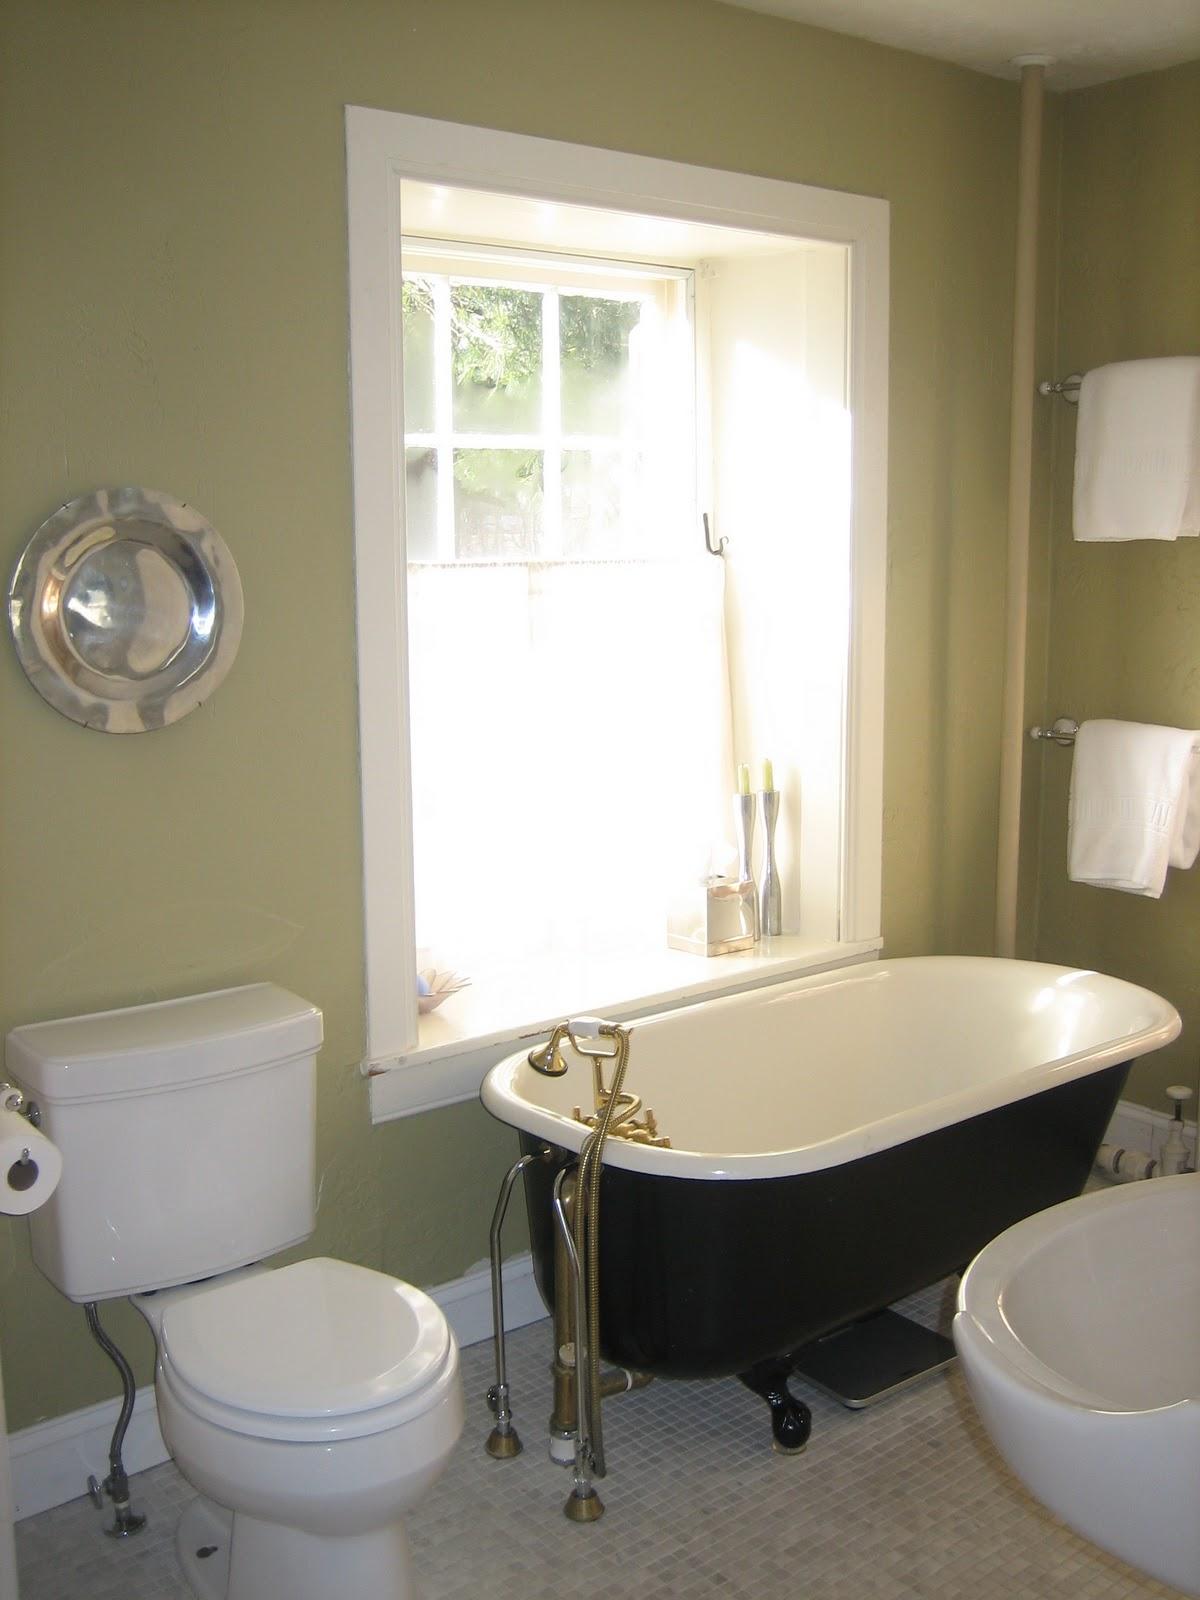 http://3.bp.blogspot.com/_eBMH_E_raPk/TUiOcYyLXDI/AAAAAAAAFi4/KhplJh_3wME/s1600/bathroom%2Bredo%2Btub.JPG